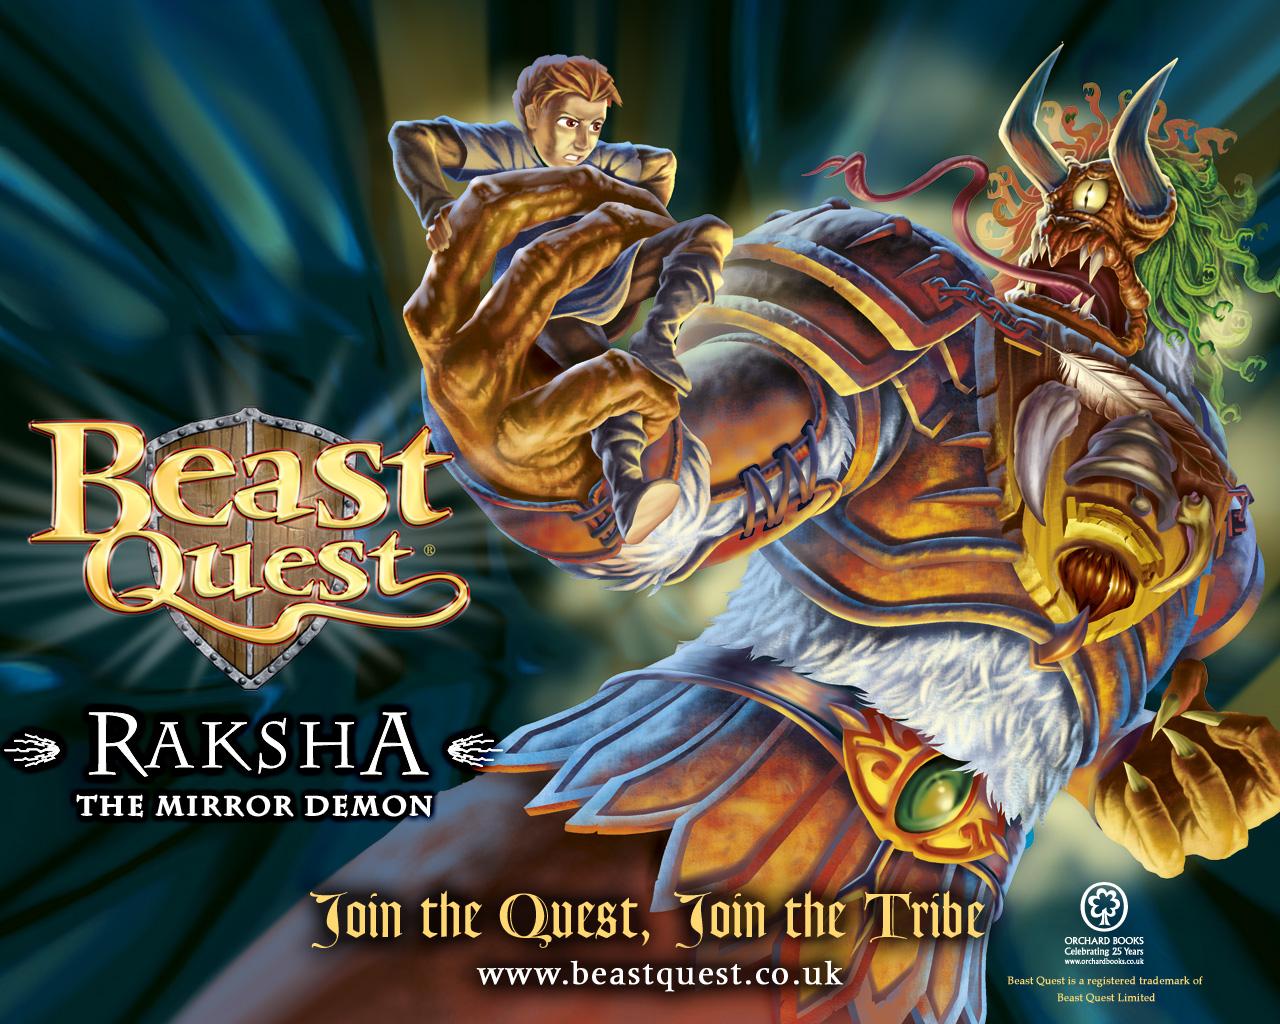 Beast quest raksha wallpaper scholastic kids club